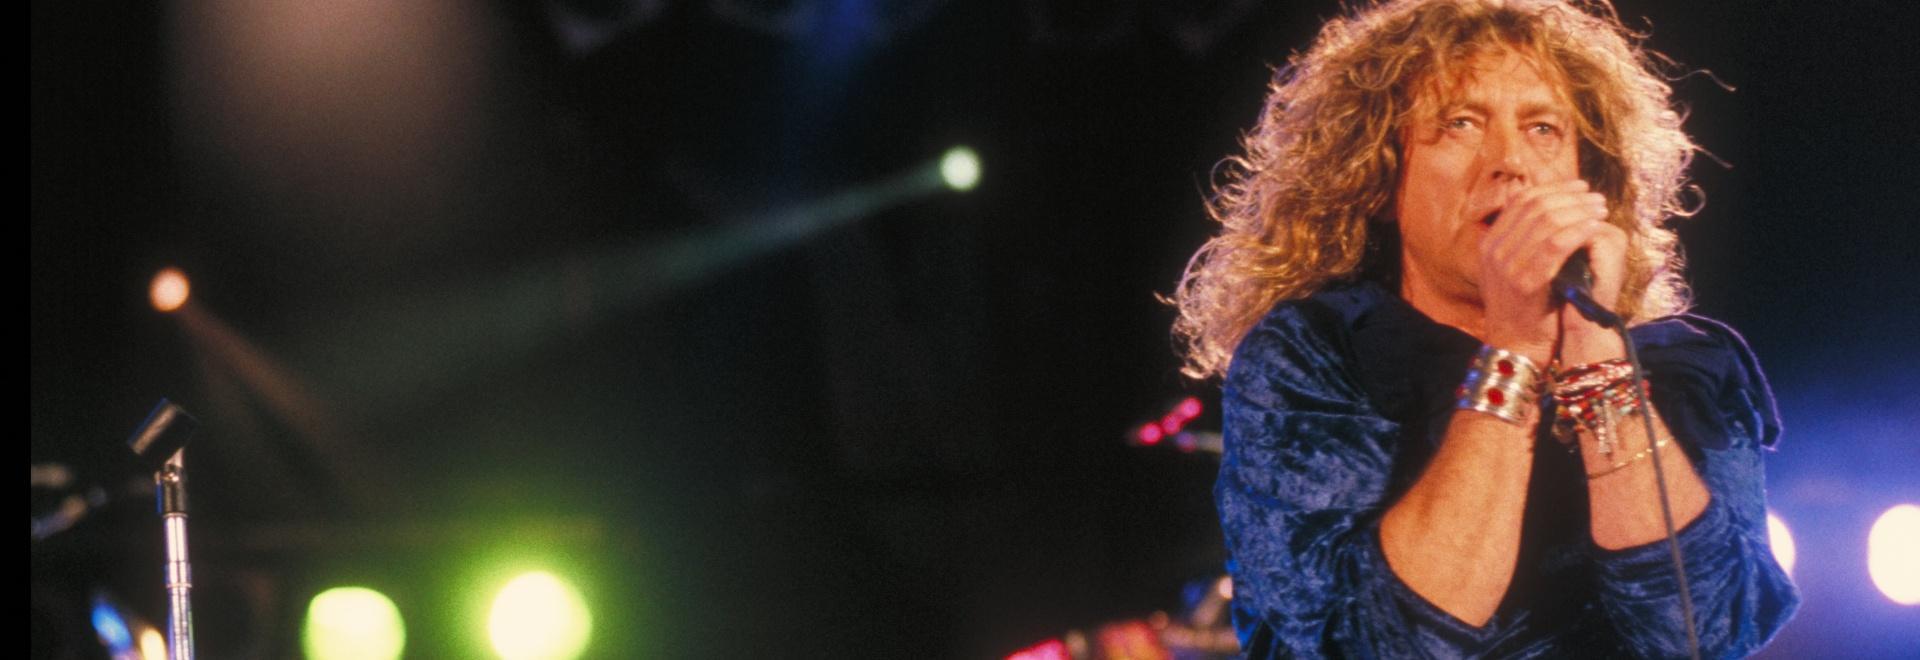 Freddie Mercury: The Tribute Concert - The Documentary